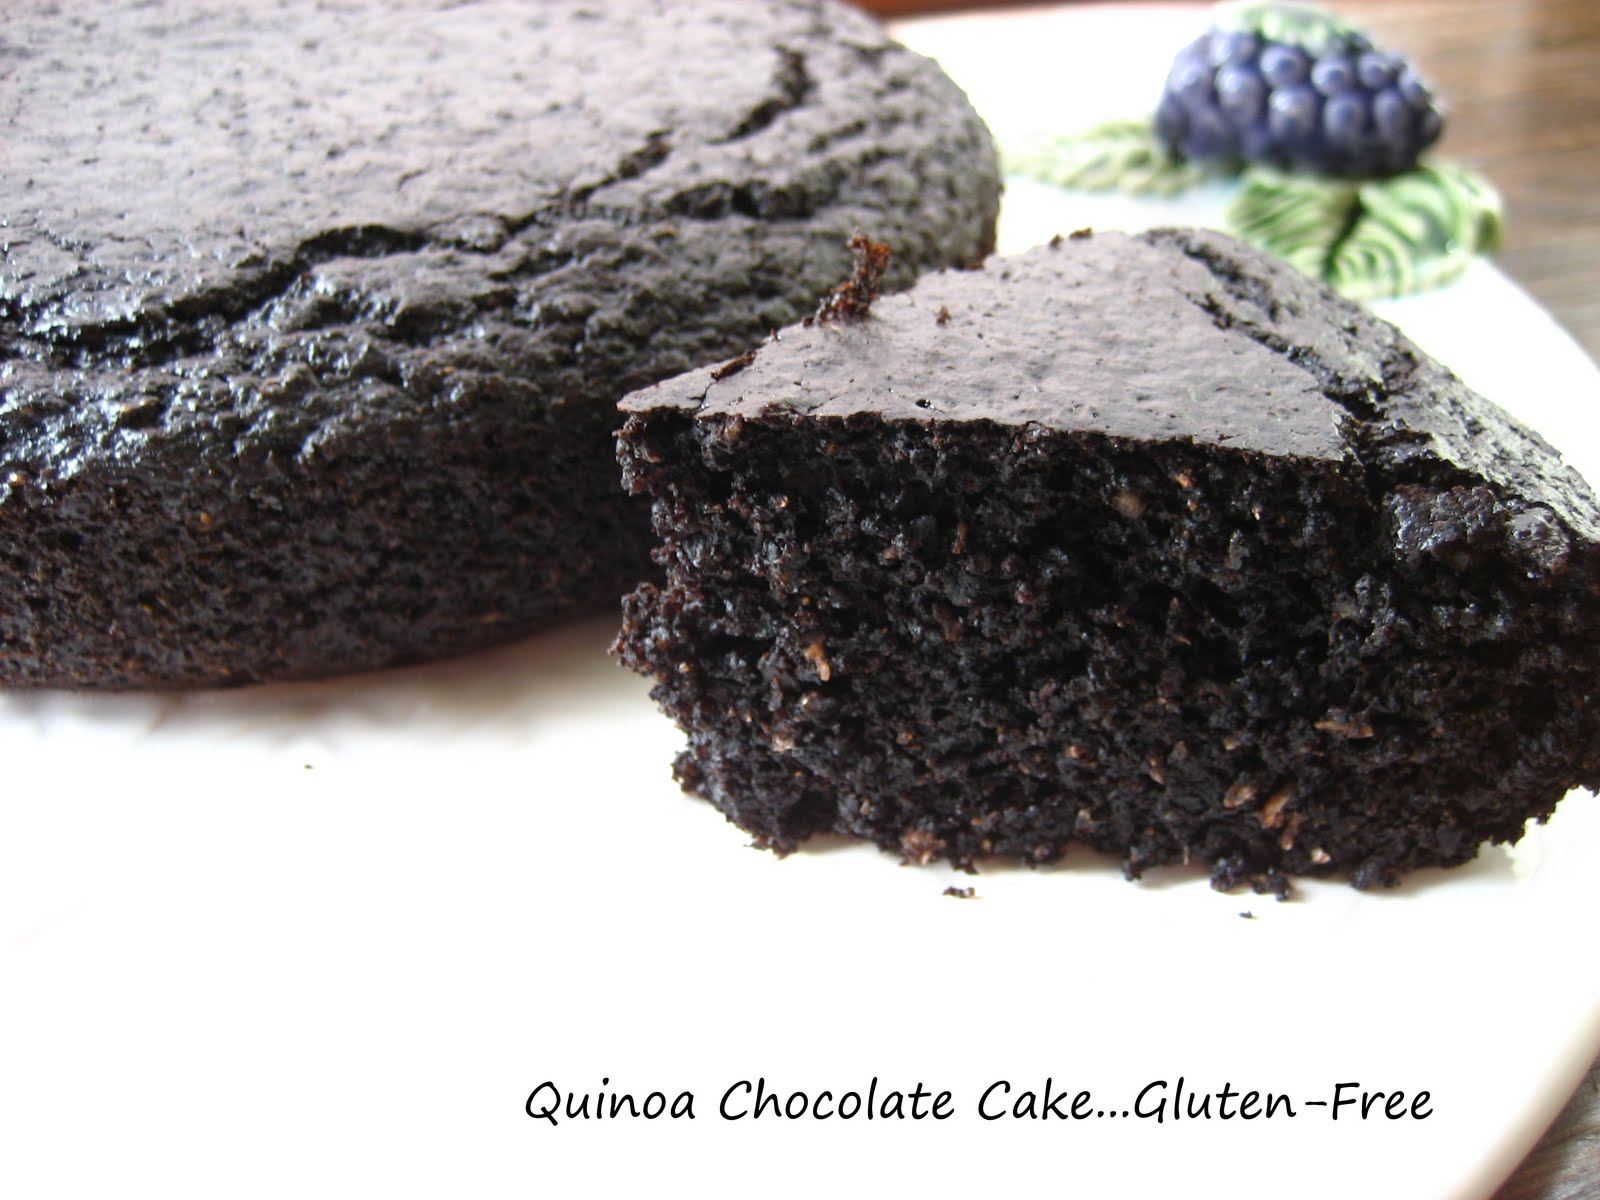 Home Cooking In Montana: Chocolate Quinoa Cake...Gluten-Free